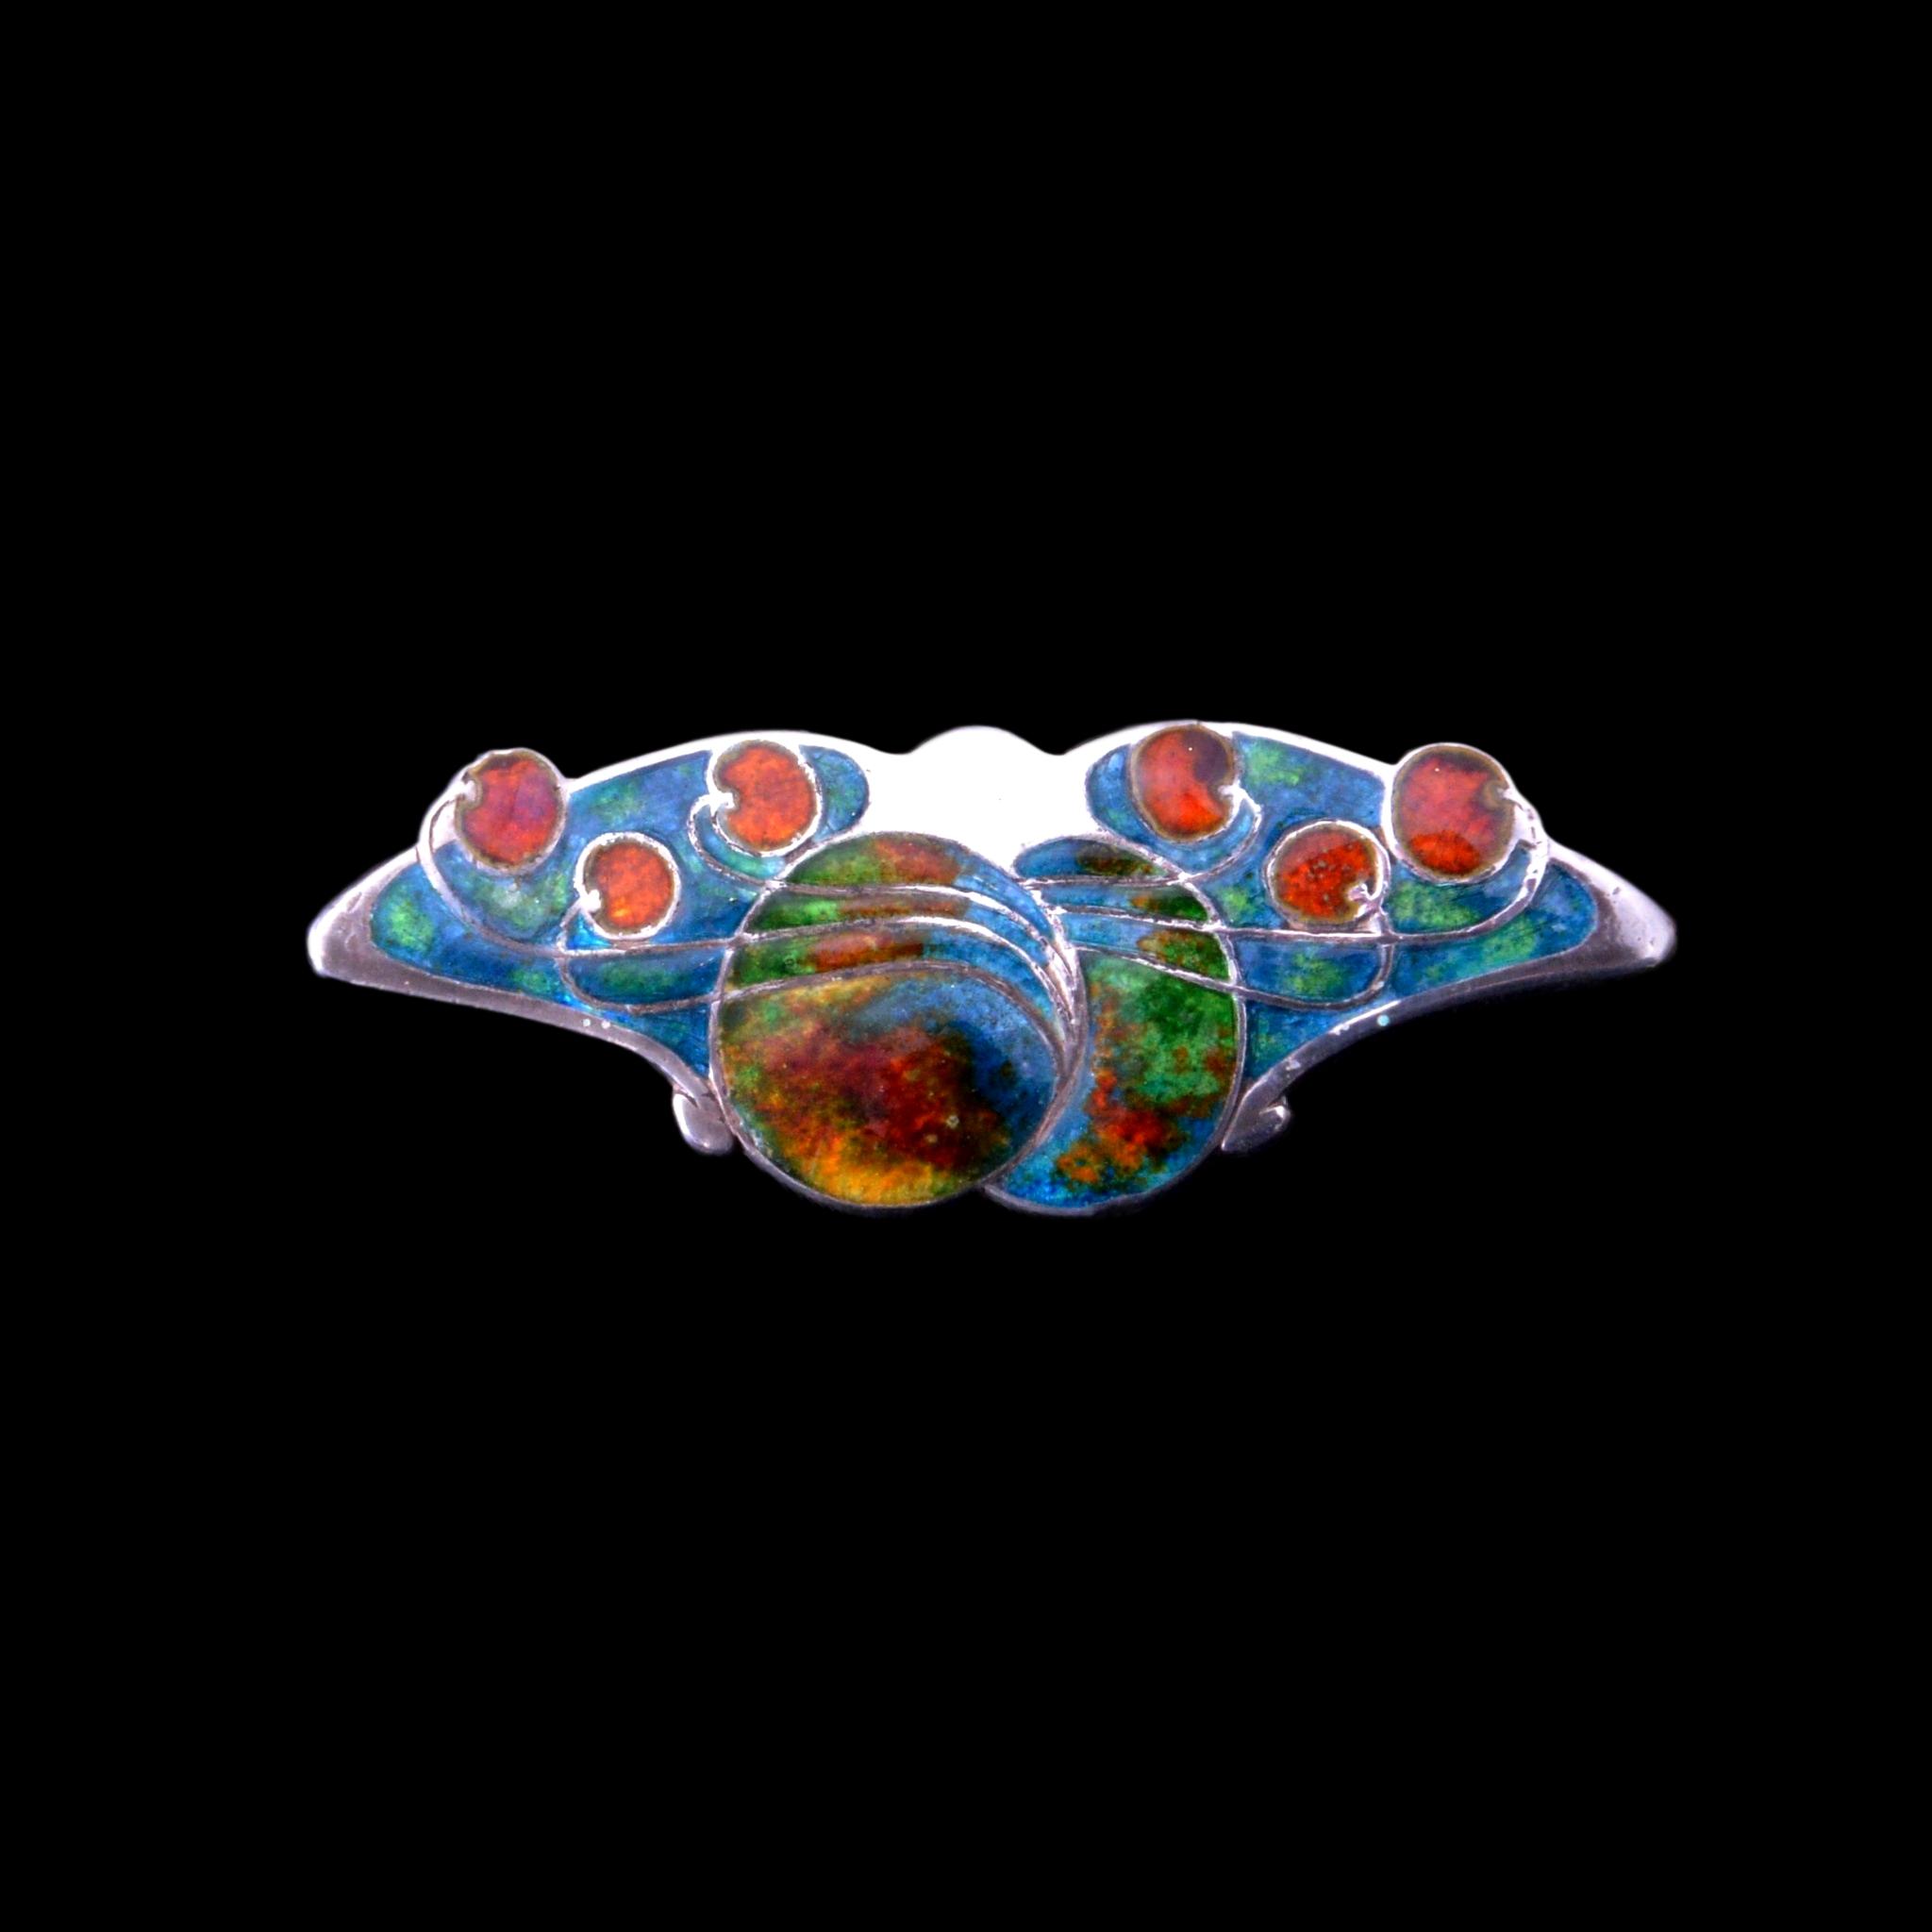 Archibald Knox jewellery, Liberty Cymric jewellery